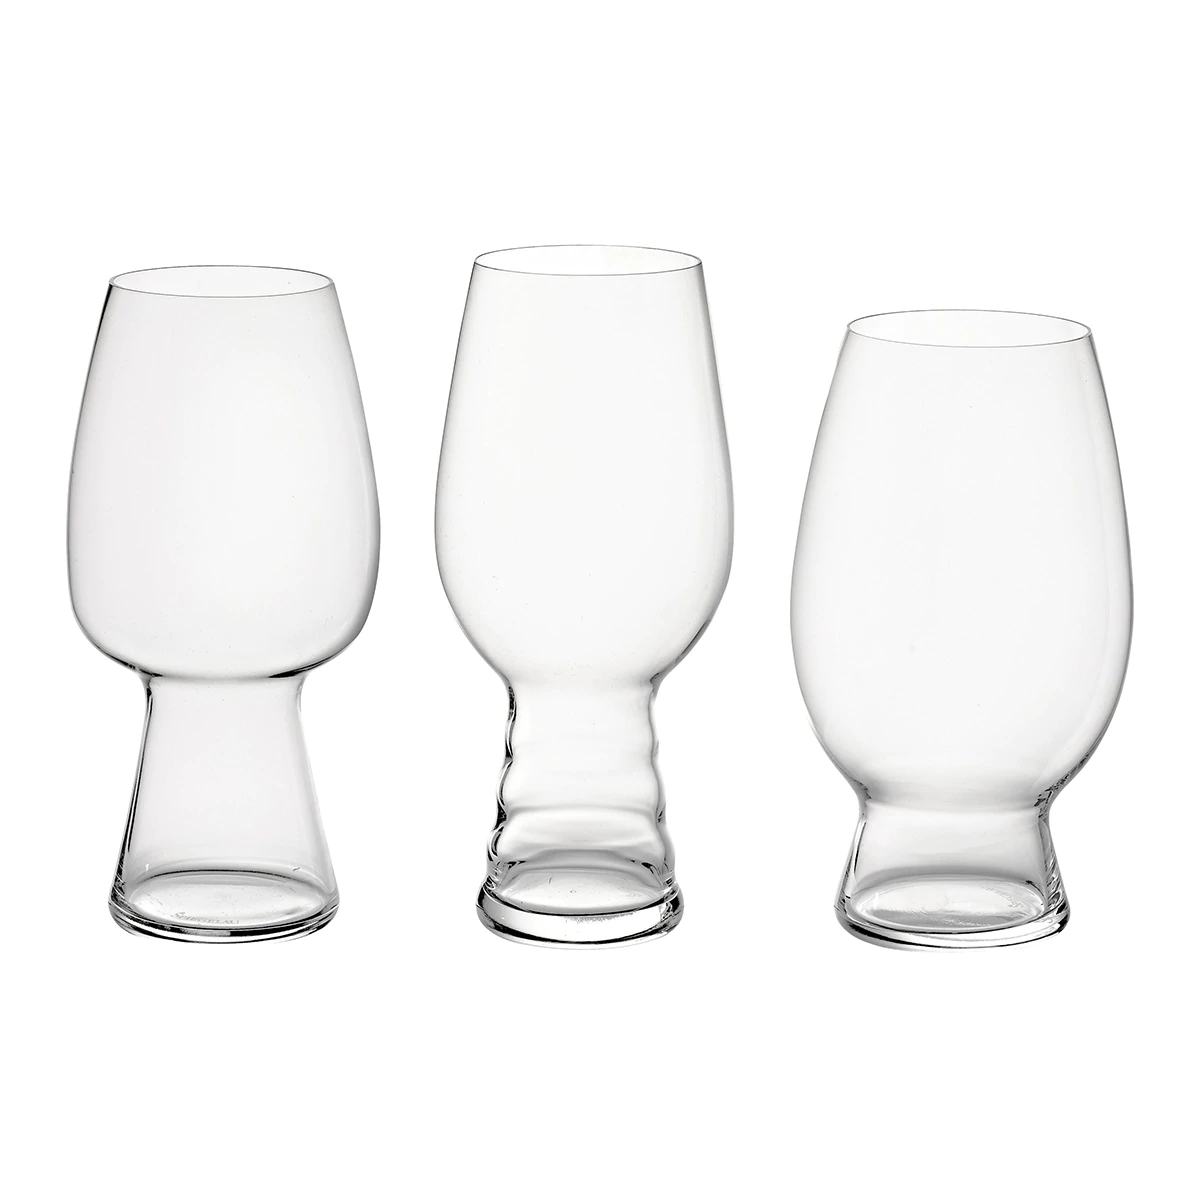 Set de vasos de cerveza